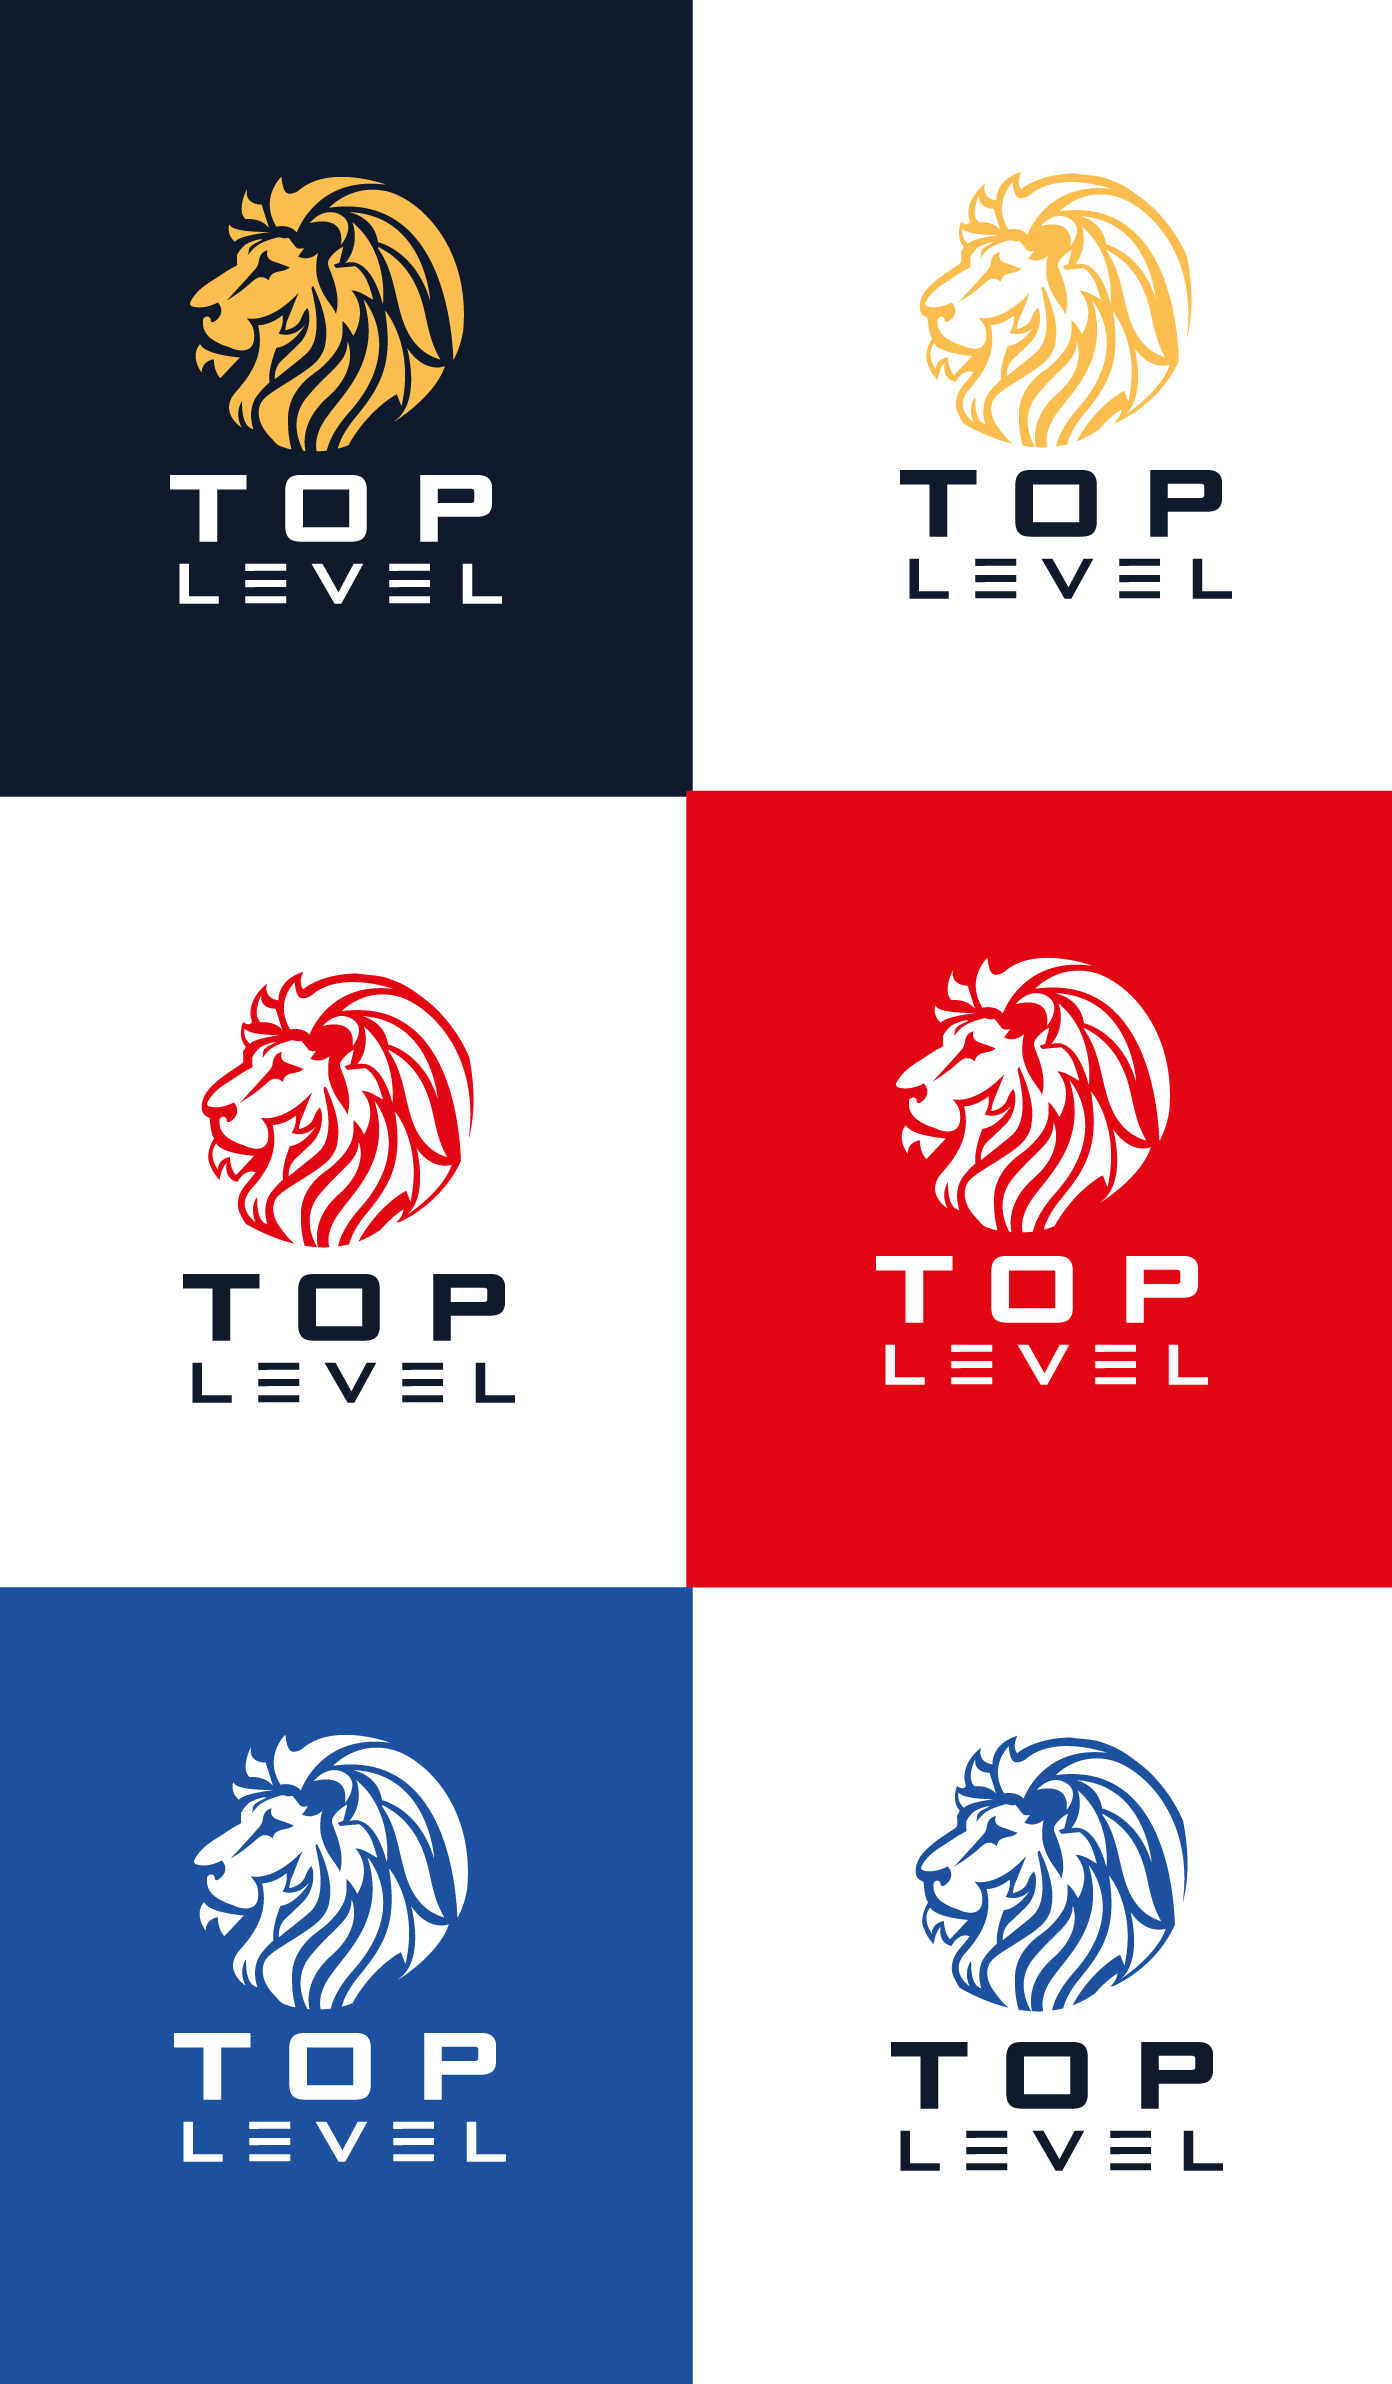 Разработка логотипа для тюнинг ателье фото f_2725f4bd75c23aab.jpg